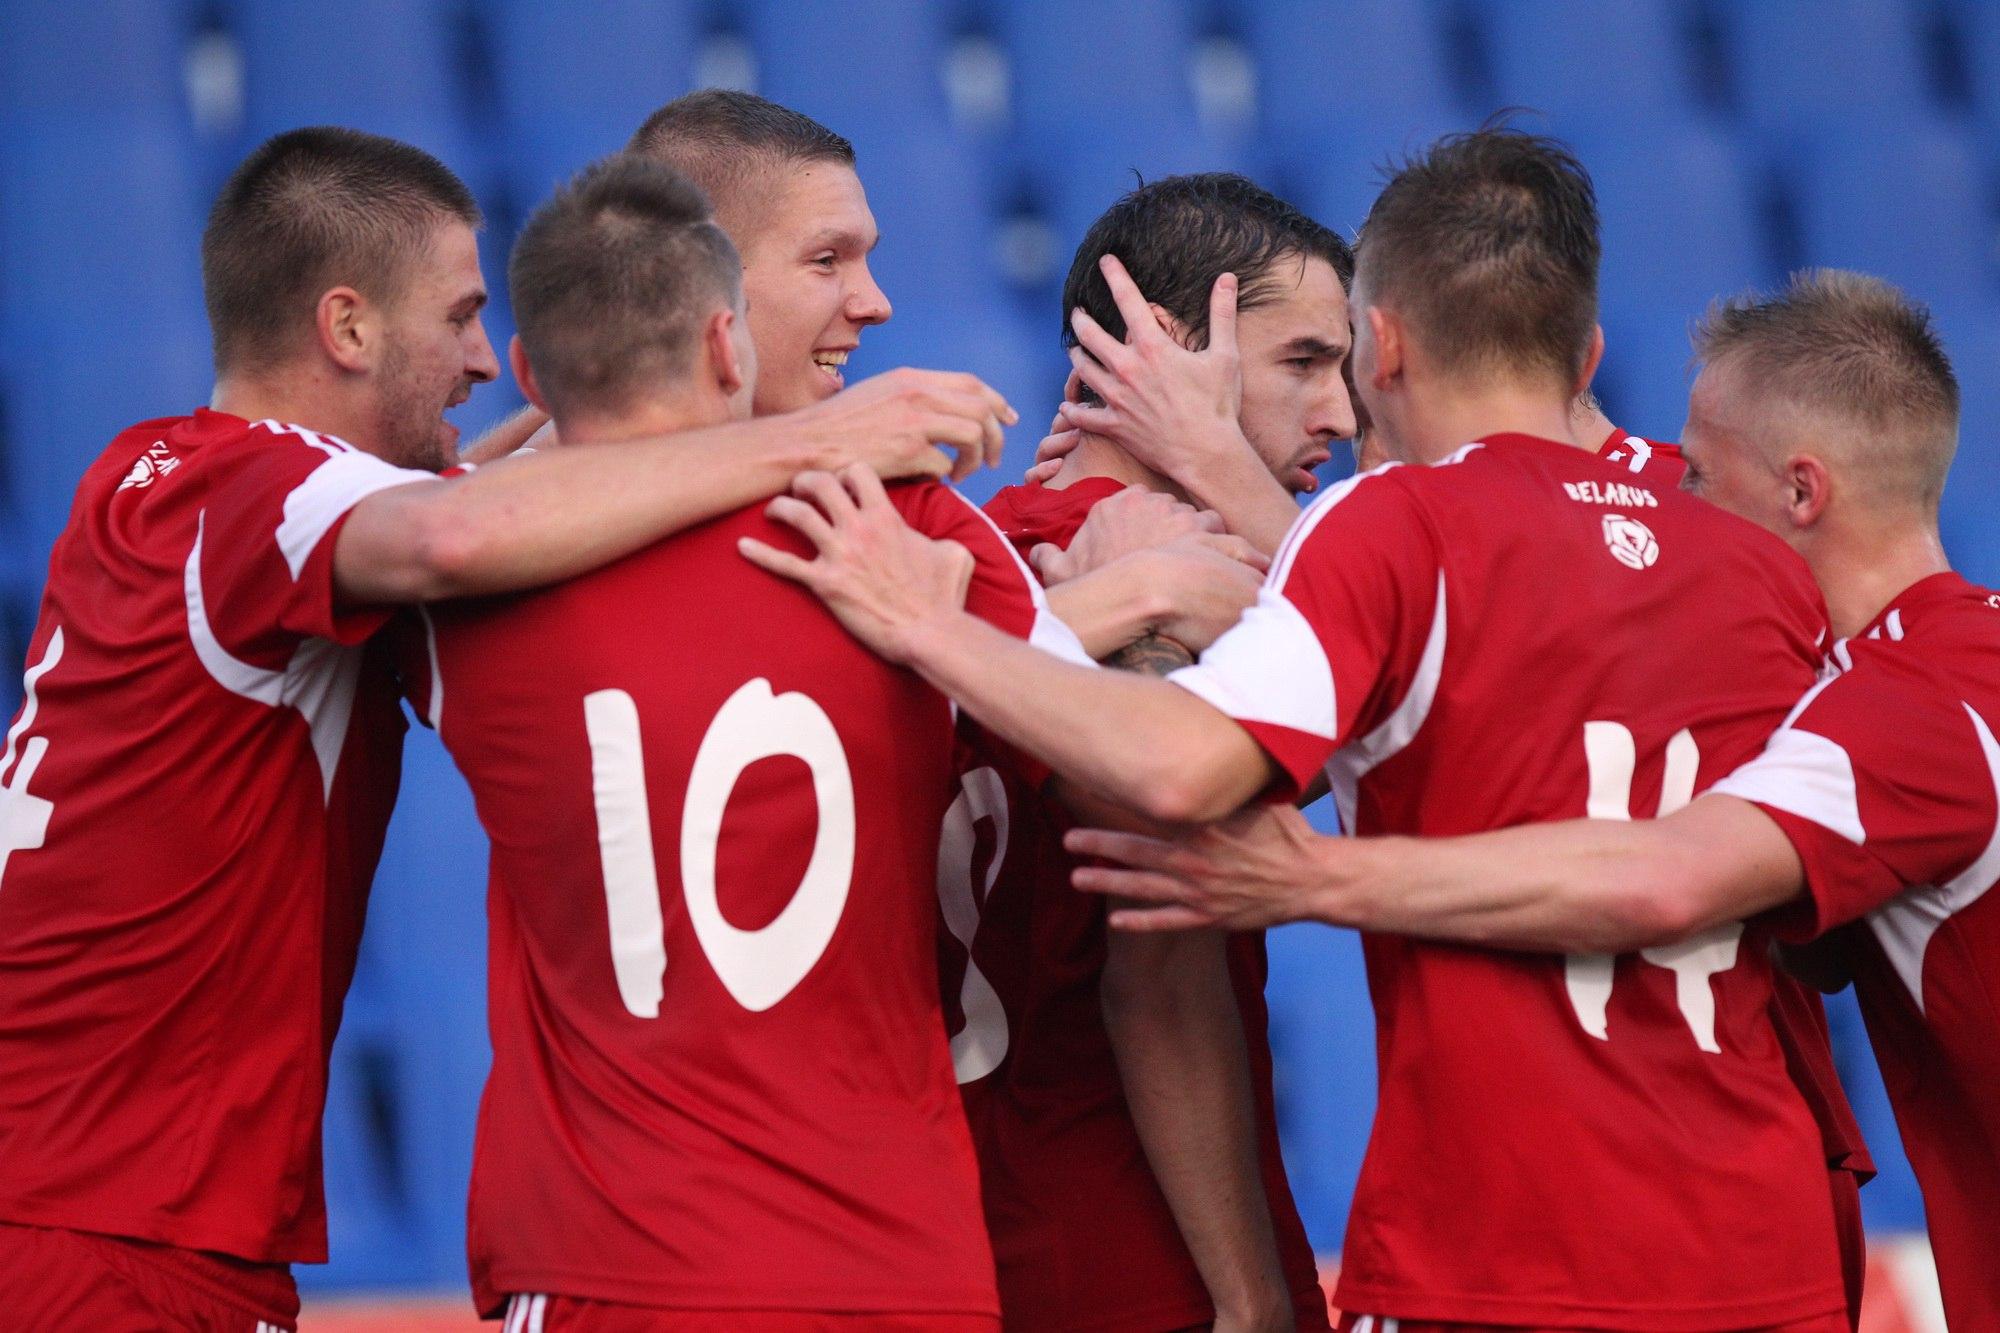 Трансляция матча Беларусь (U-21) — Сан-Марино (U-21), 6 июня 2017